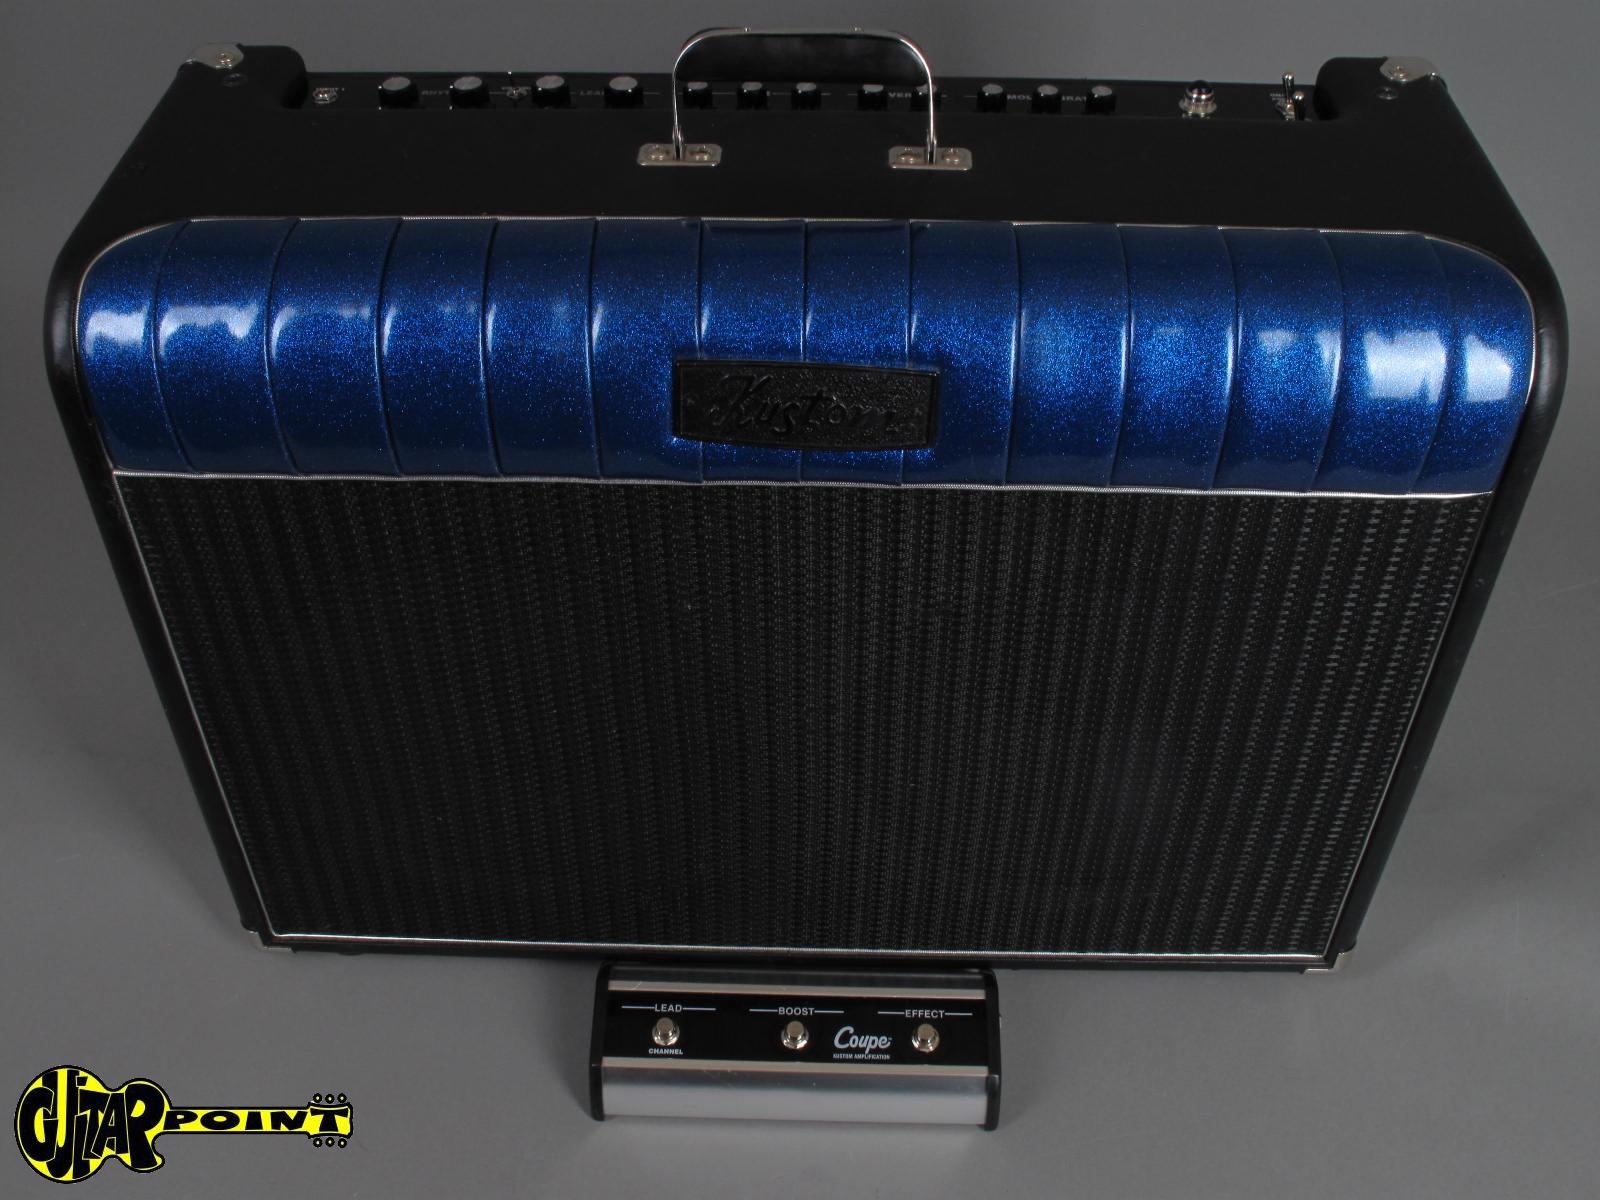 https://guitarpoint.de/app/uploads/products/1990s-kustom-coupe-72-2x12-tuck-roll/KustomCoupe72SN0541C07906_4.jpg